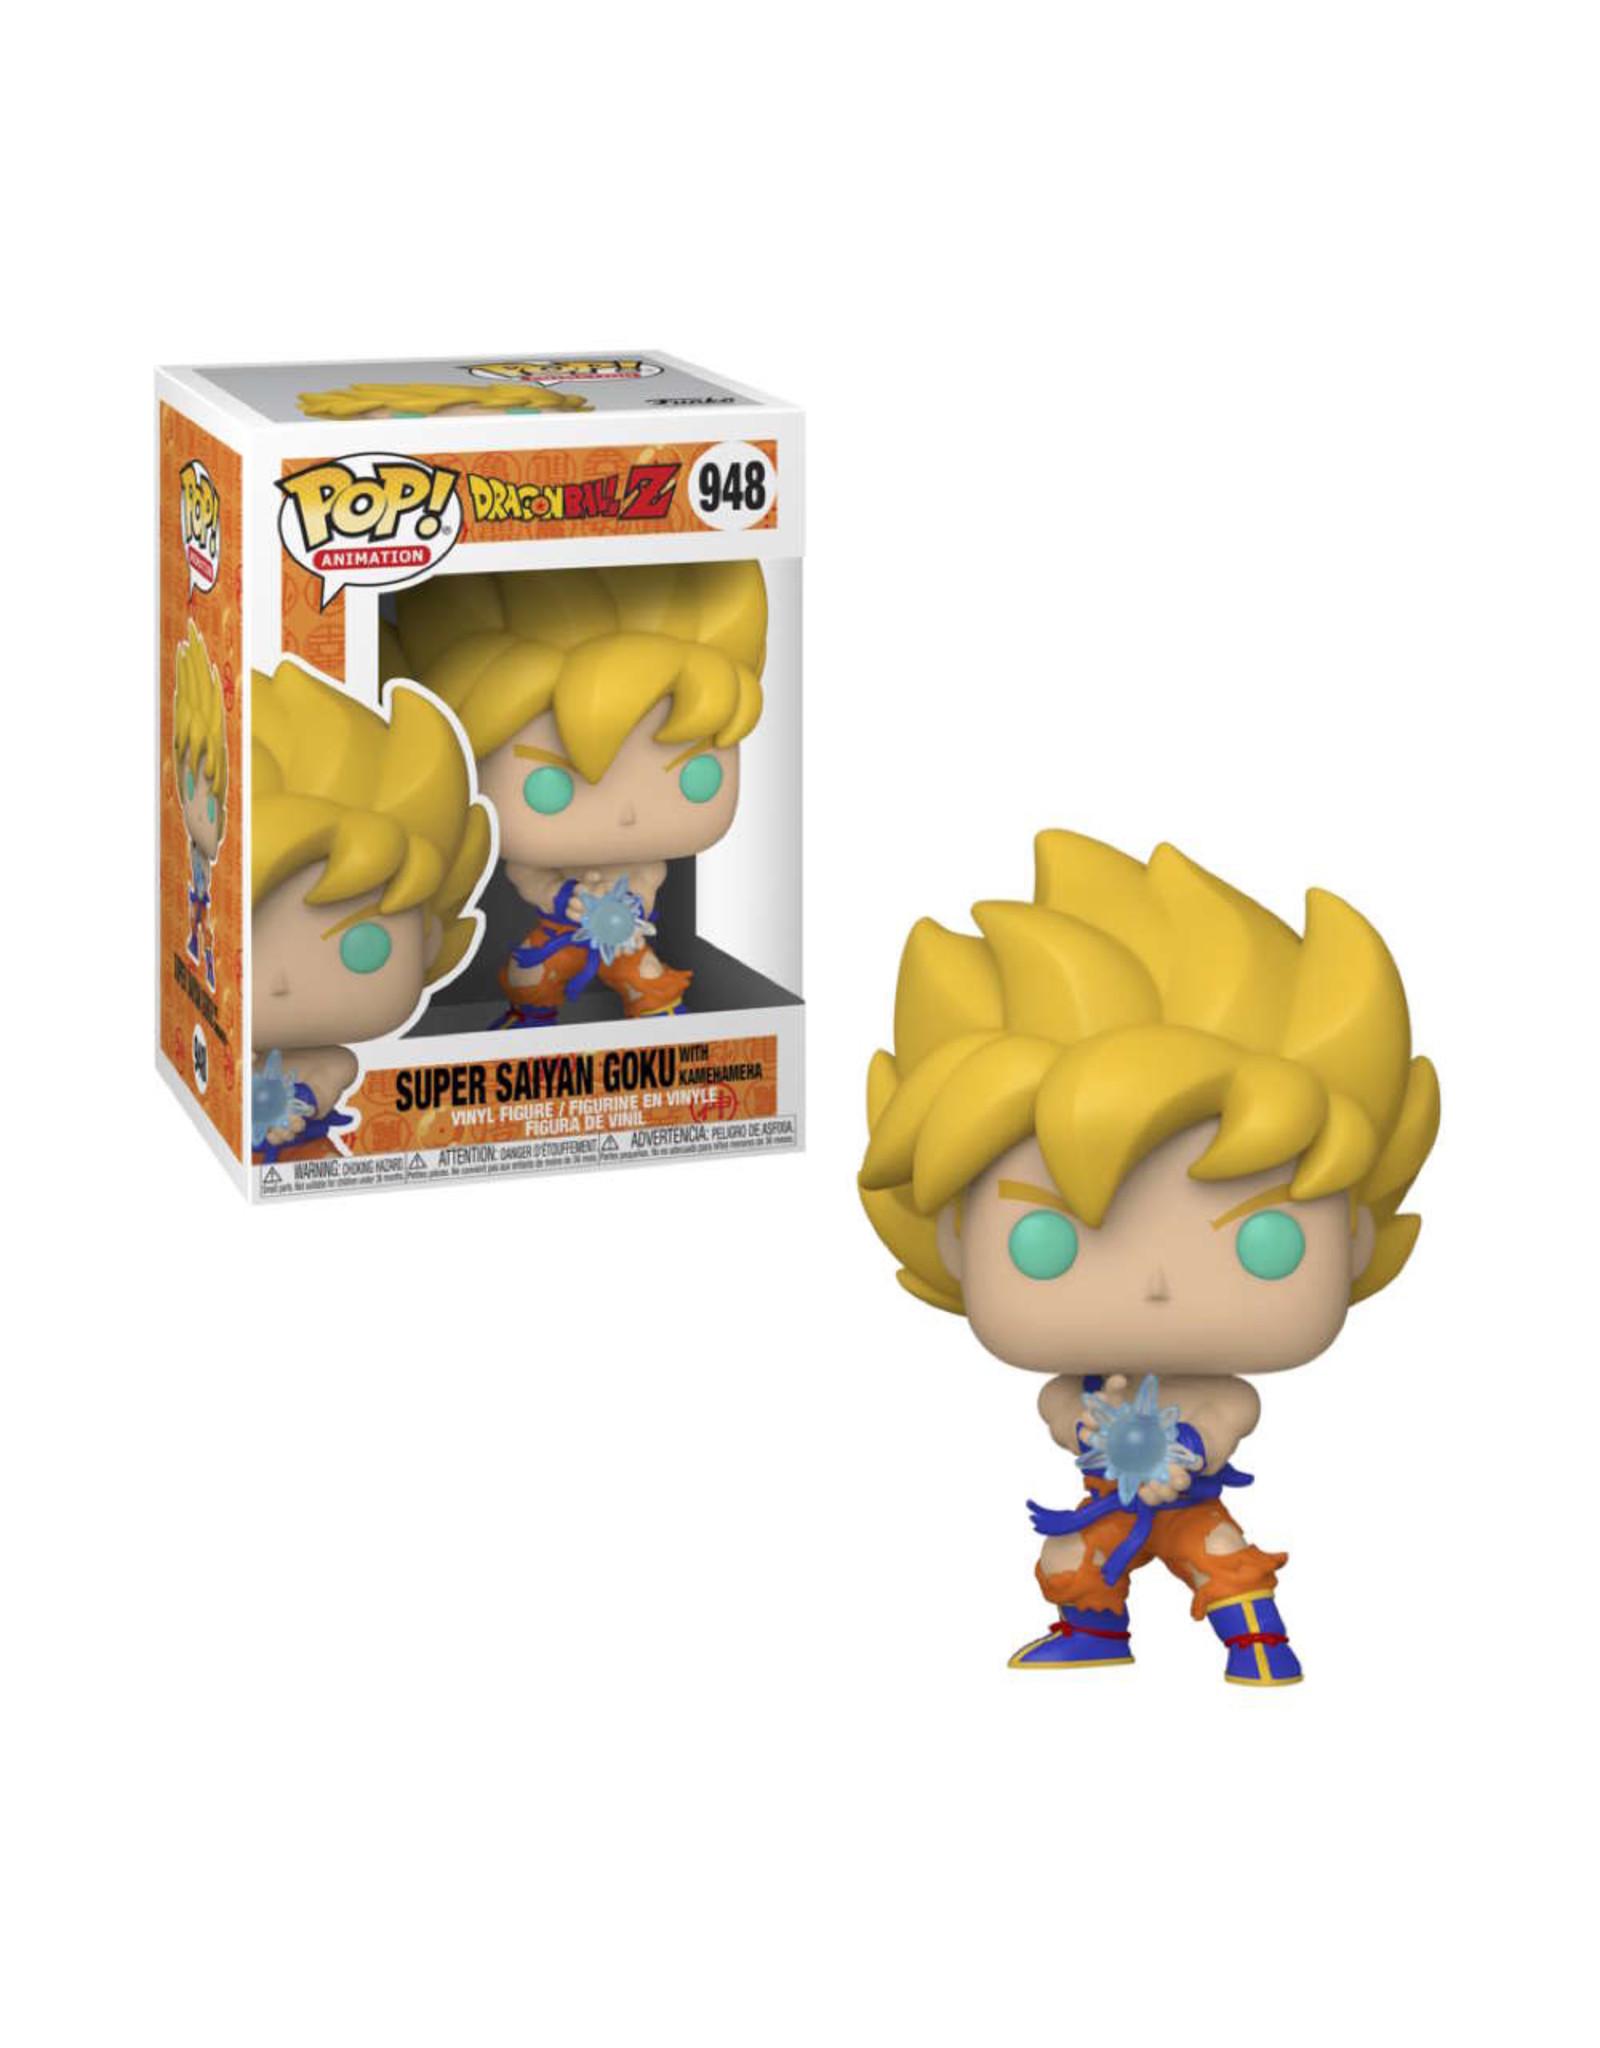 Dragon Ball Z - Super Saiyan Goku with Kamehameha - Funko Pop! Animation 948